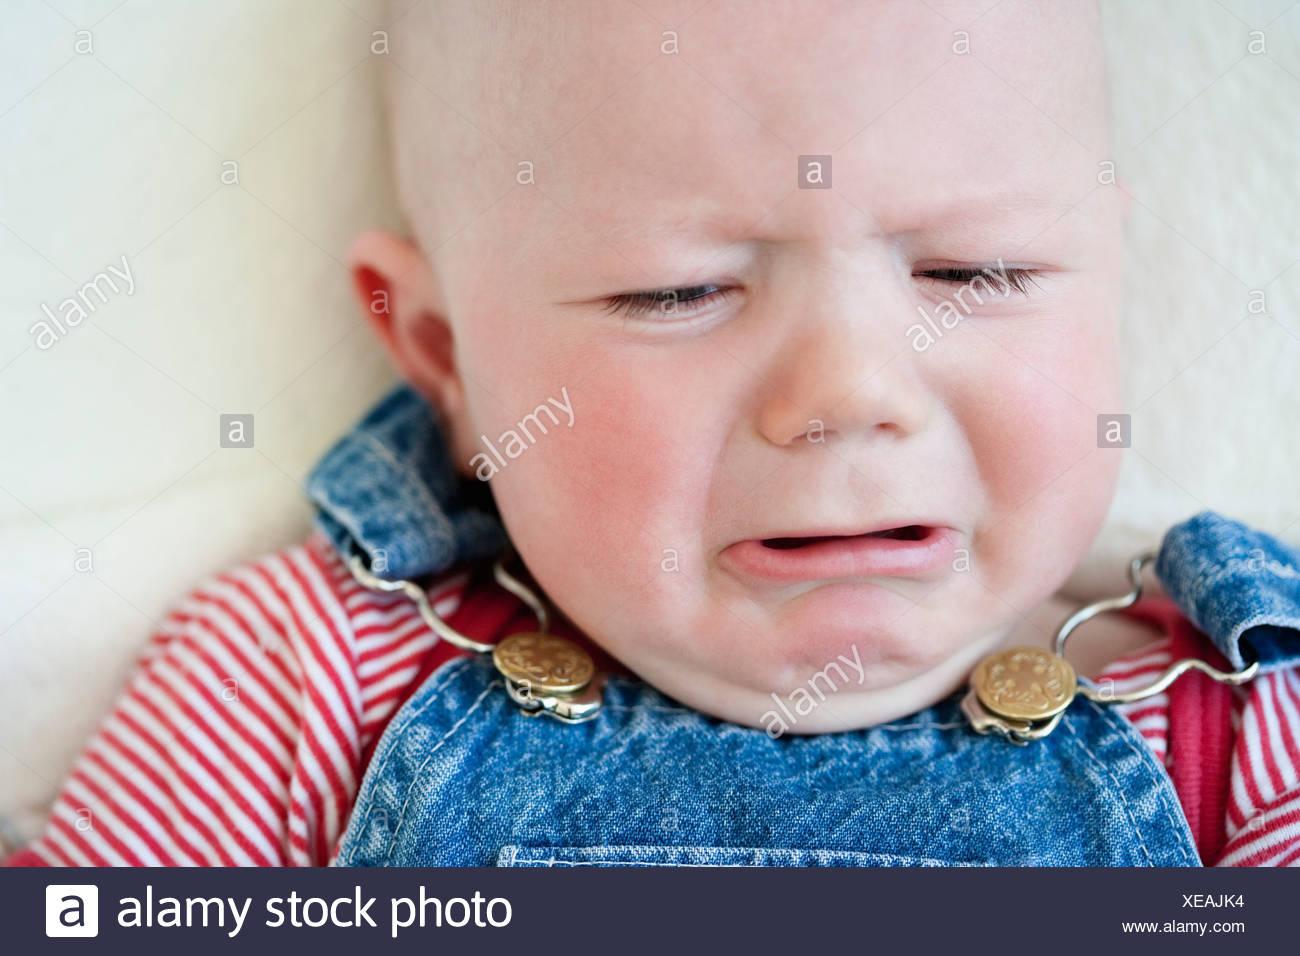 Crying baby-boy - Stock Image